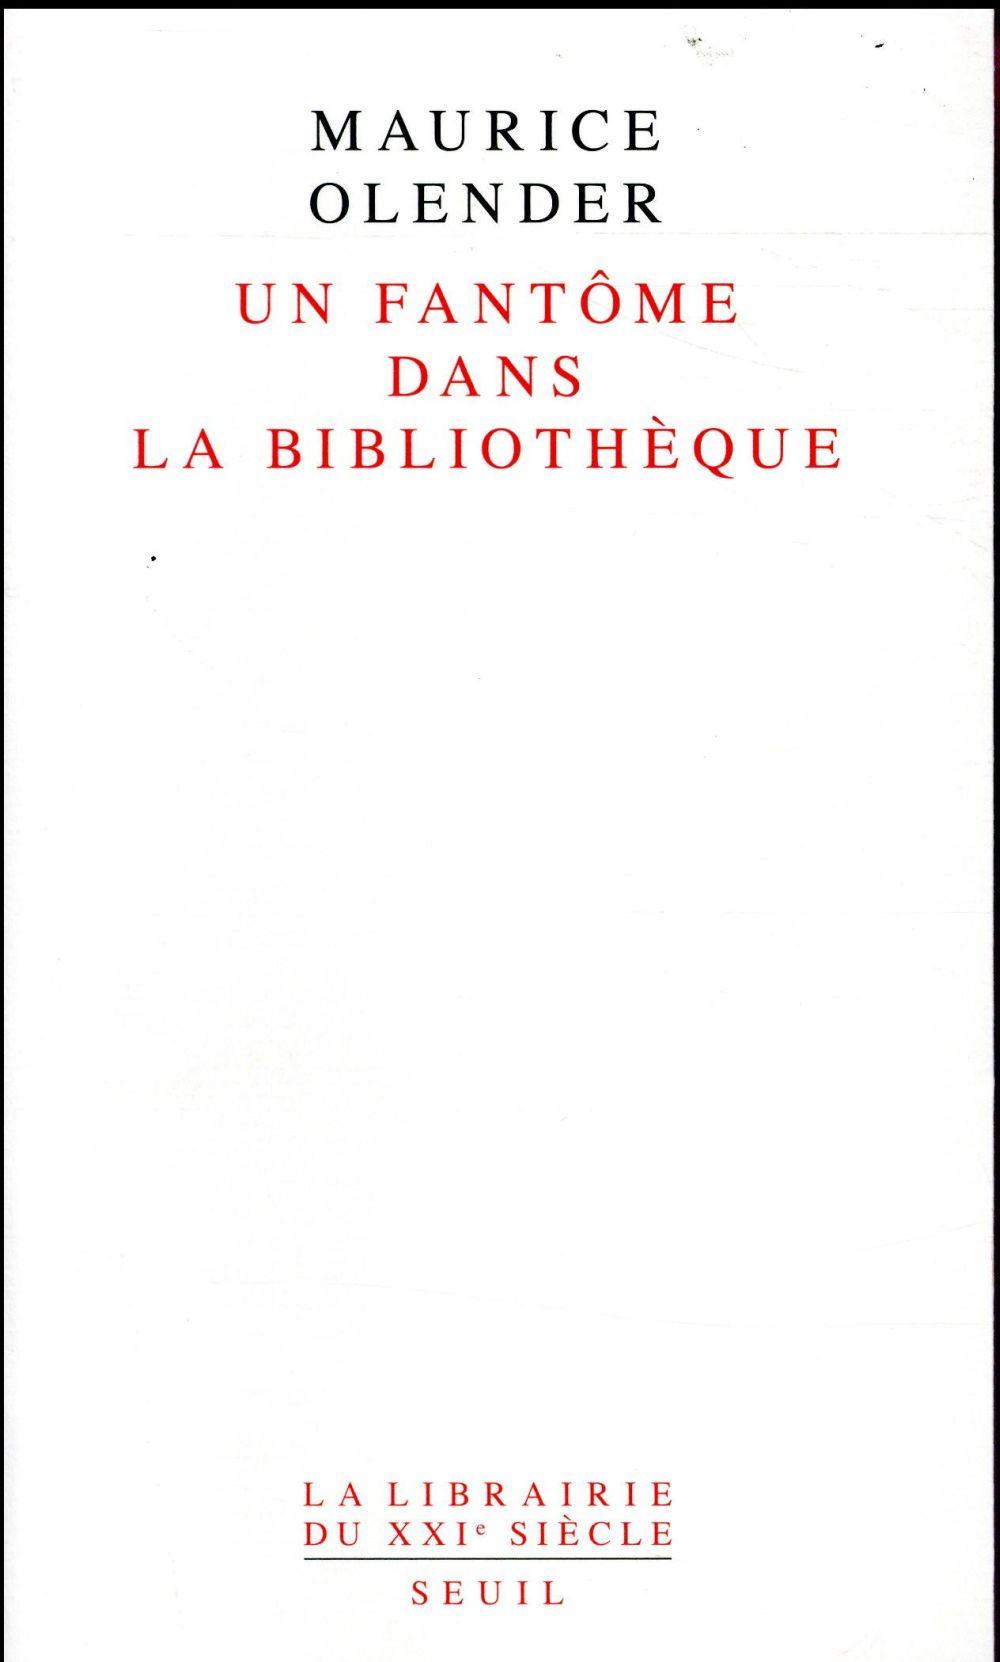 UN FANTOME DANS LA BIBLIOTHEQUE